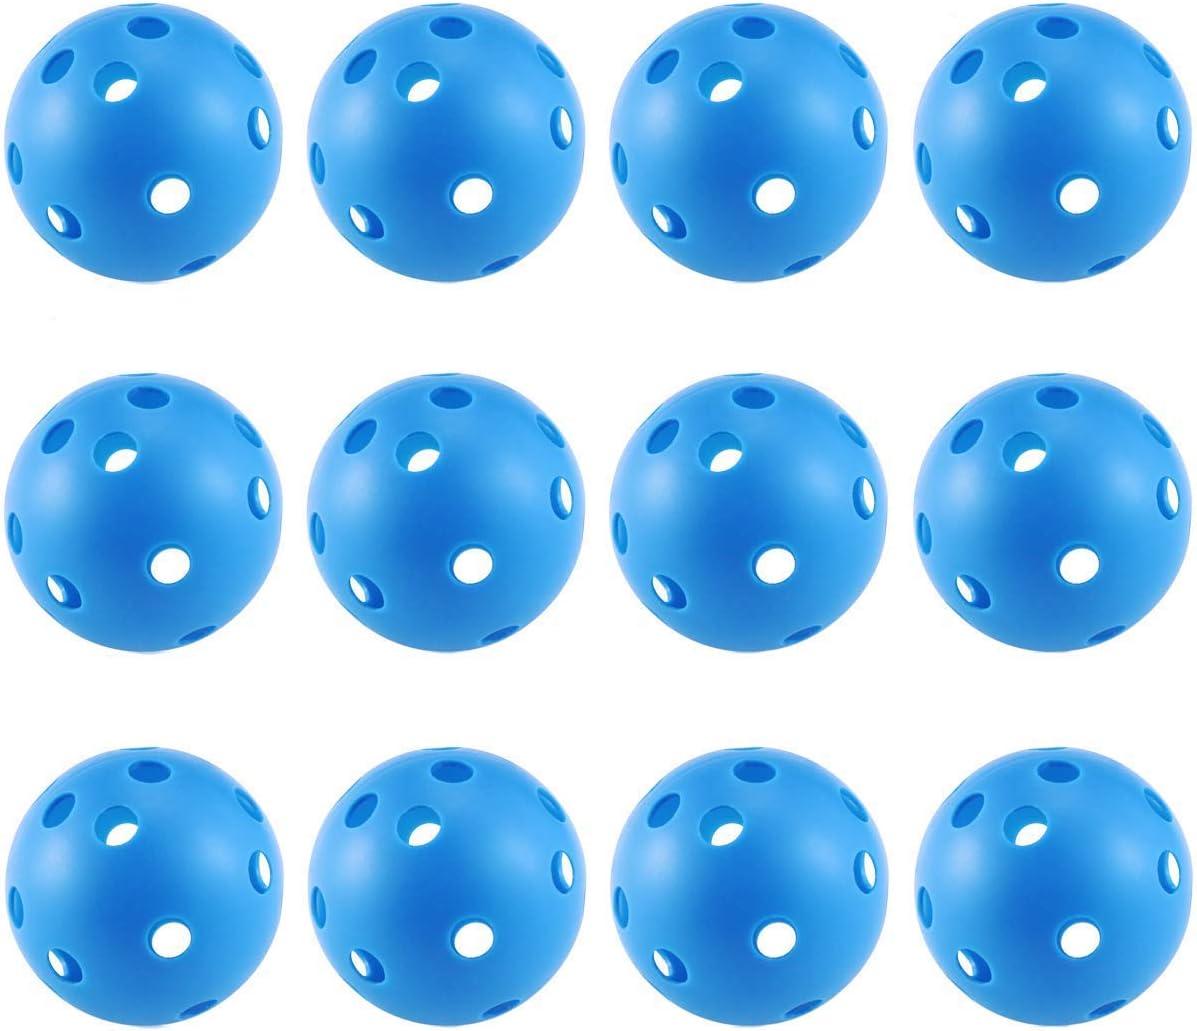 TM Adahill 12PCS x 72MM Mixed Colors Floorball Pickleball Plastic Airflow Wiffle Ball Hollow Indoor Practice Ball Baseball Fun-air Scoop Ball